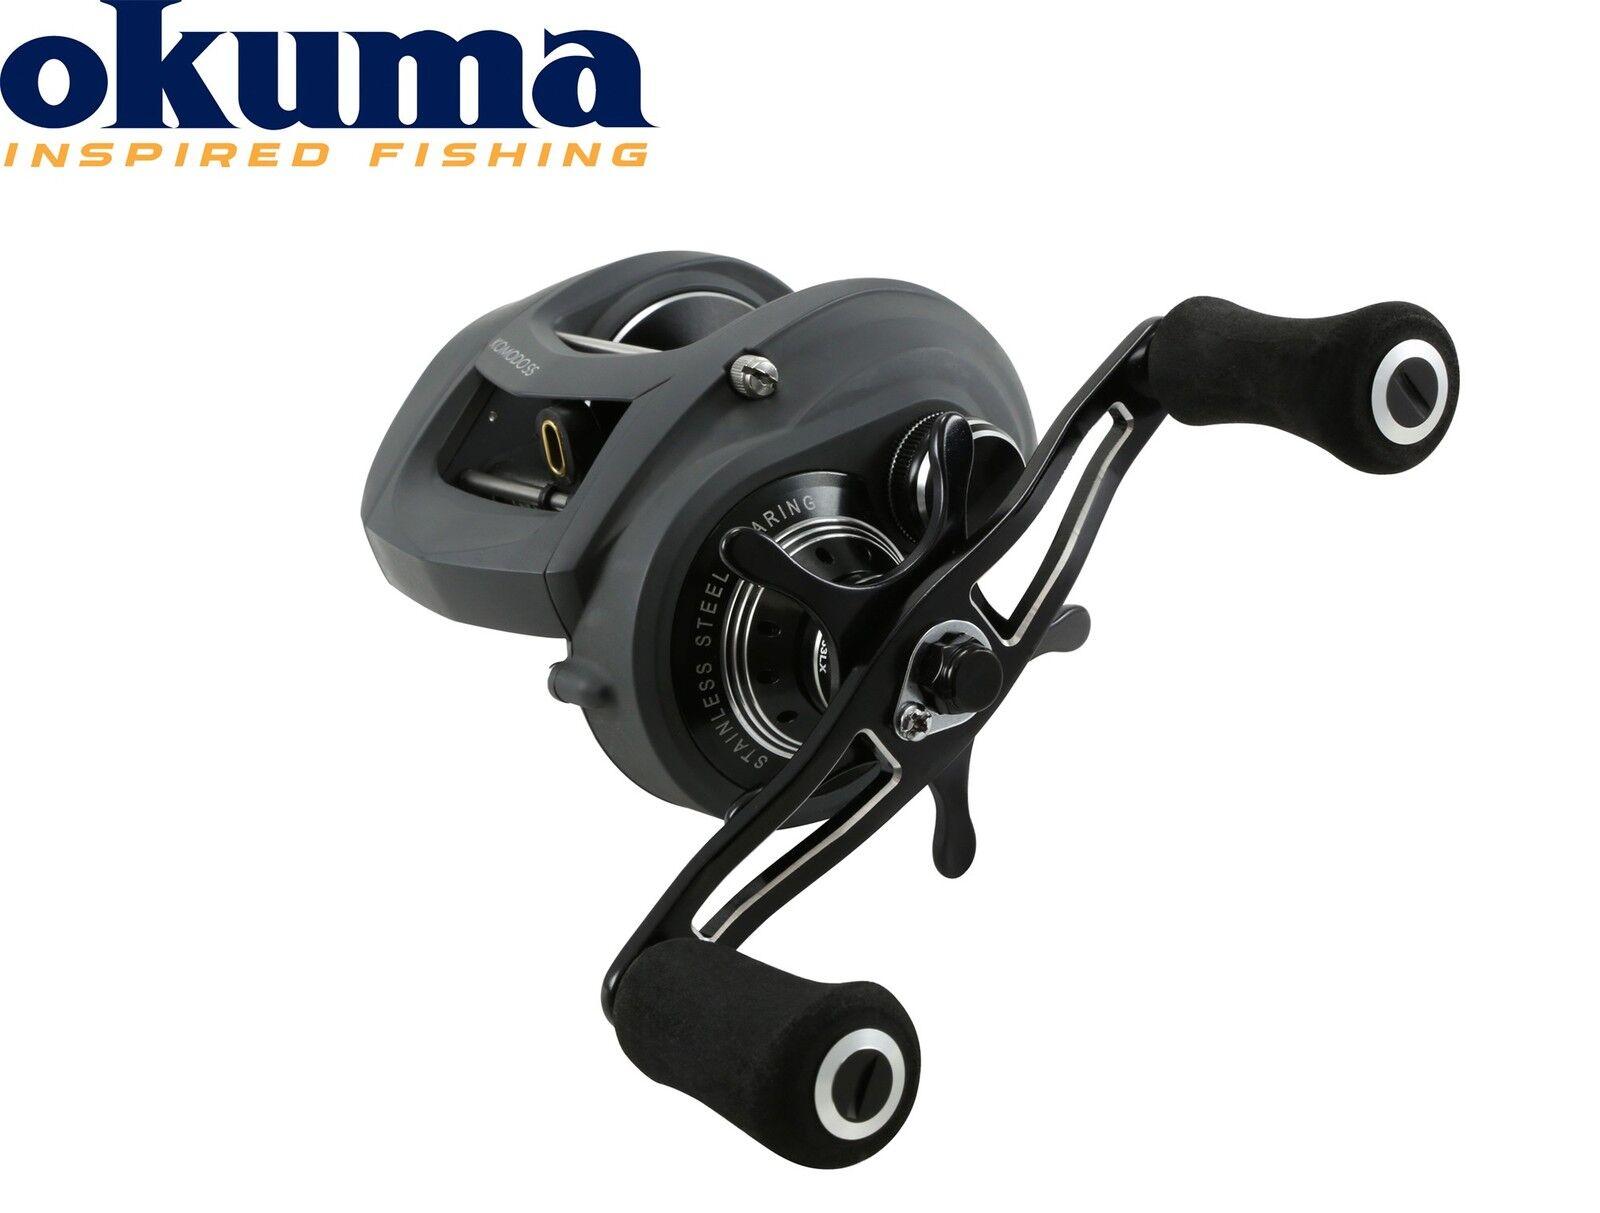 Okuma Komodo LP Niedrig KDS-463LX - Niedrig LP Profile Multirolle, Baitcasterrolle, Spinnrolle 3624a7